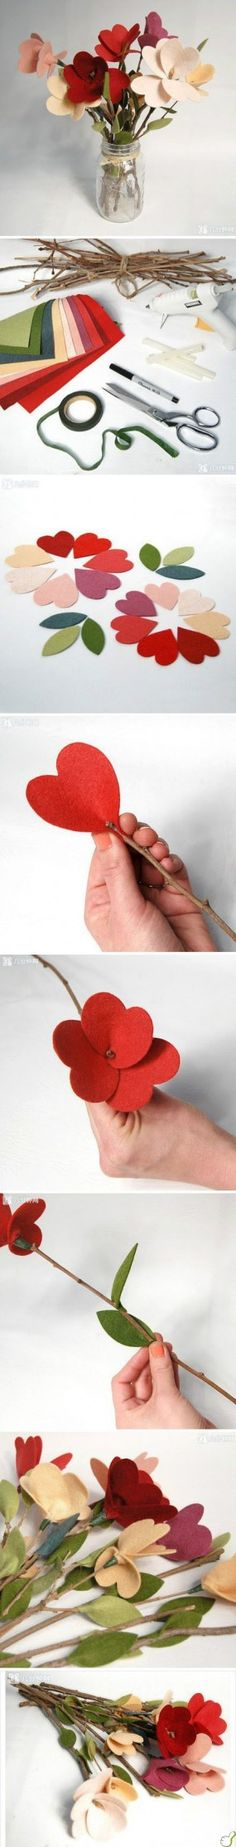 Surprise DIY - felt flowers